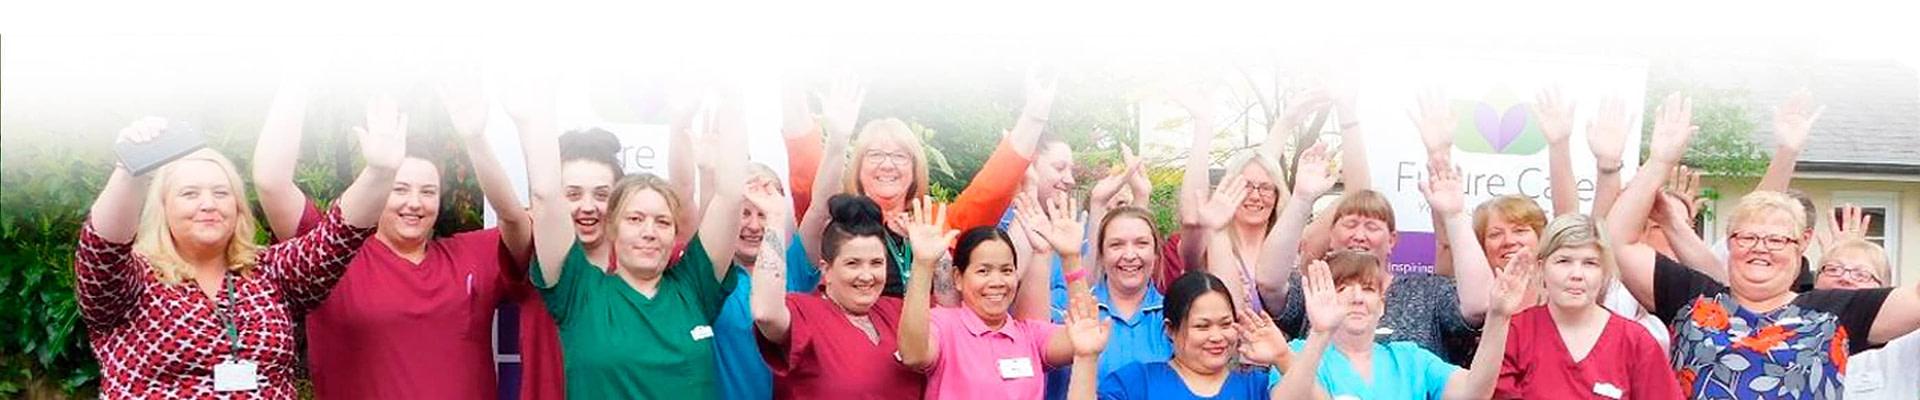 Future Care Group Staff Portal